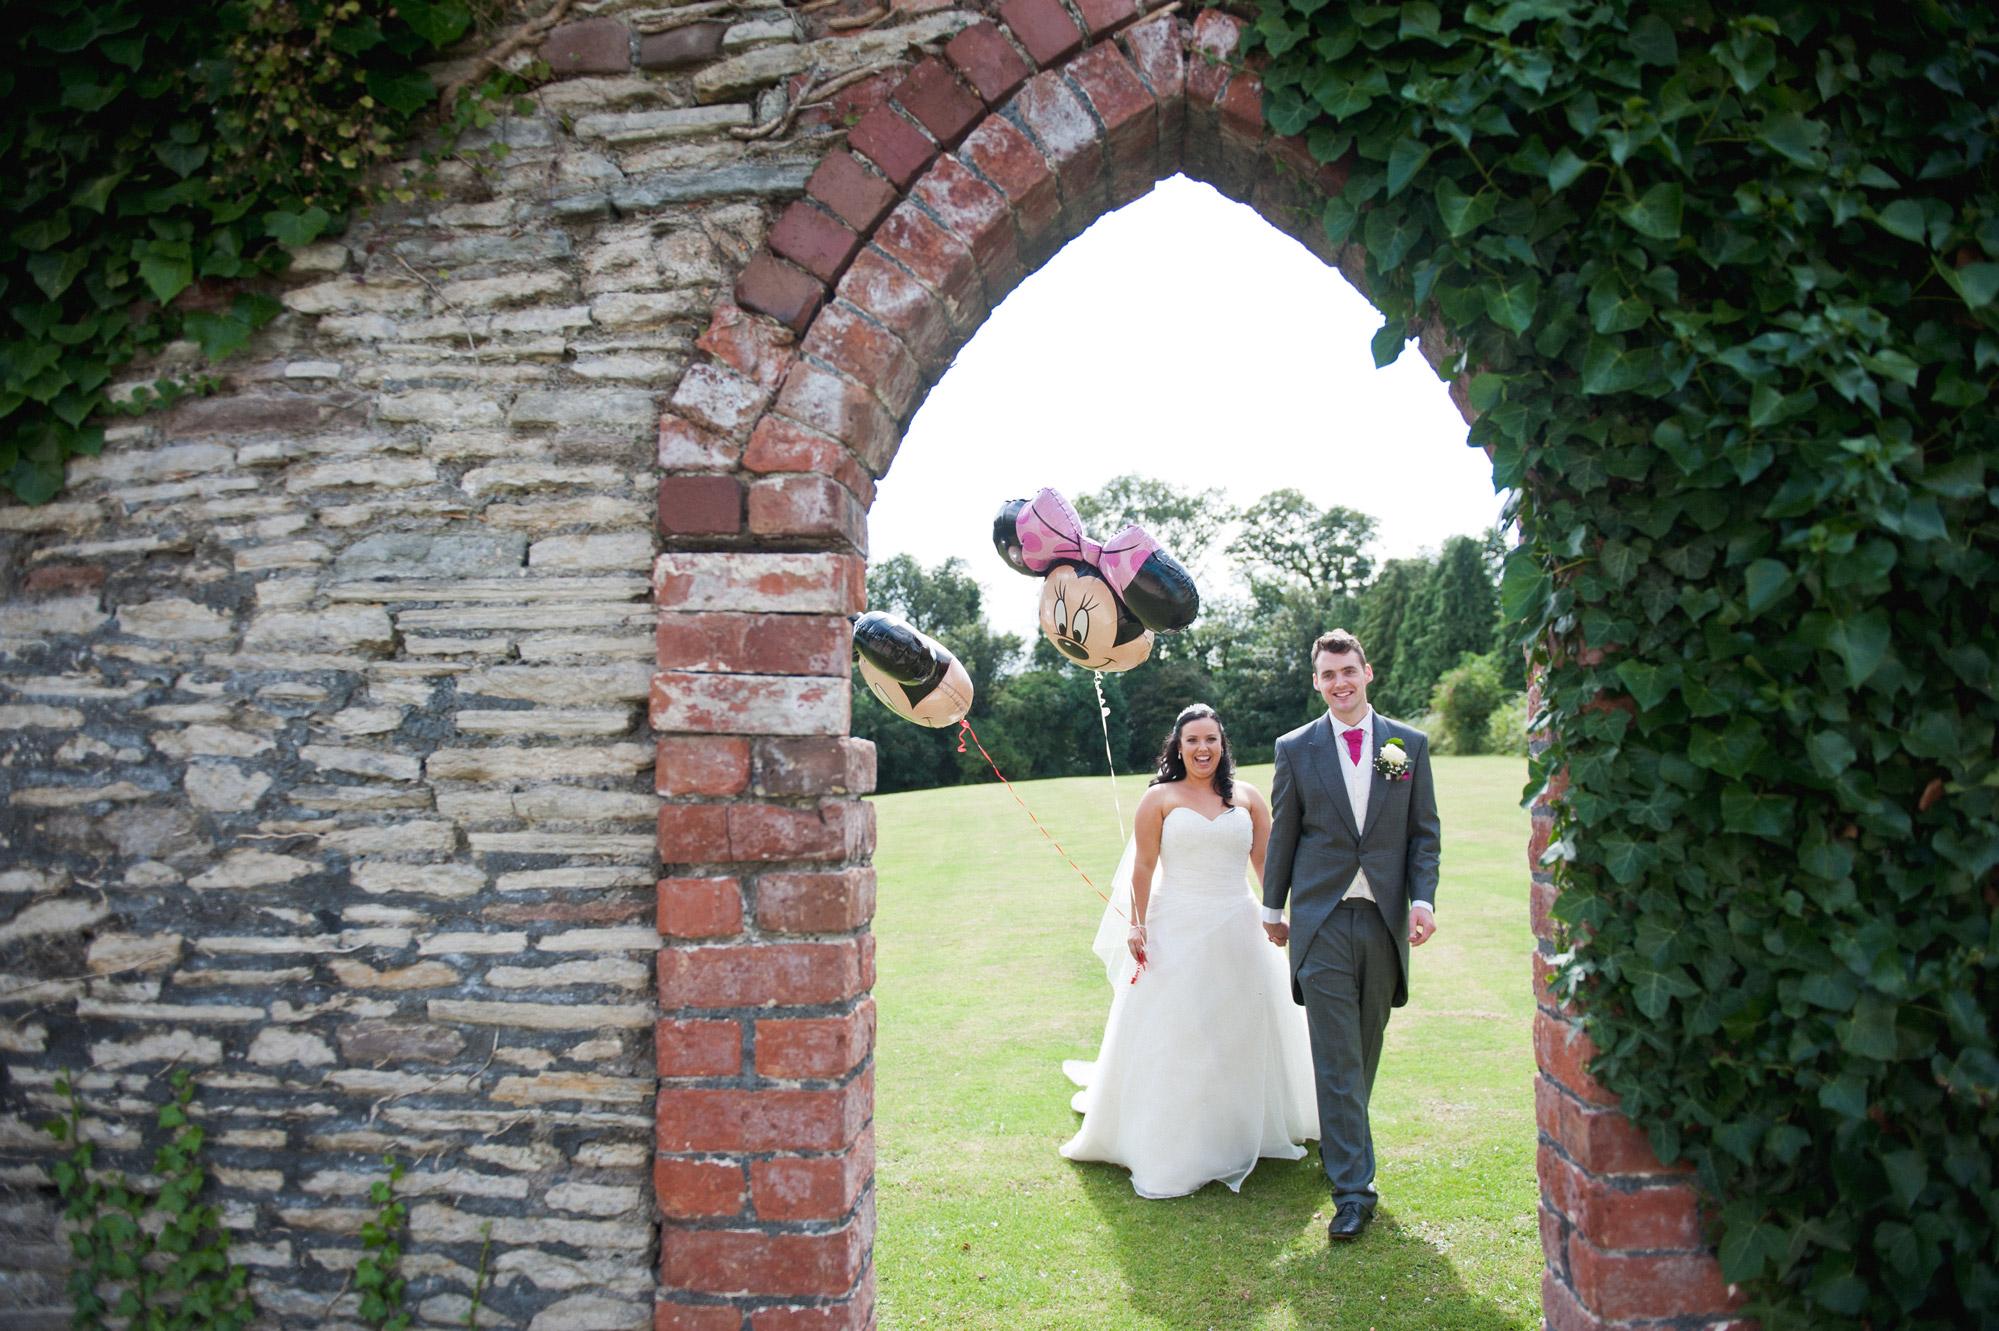 Jenna & Ciaran - Wedding Ideas